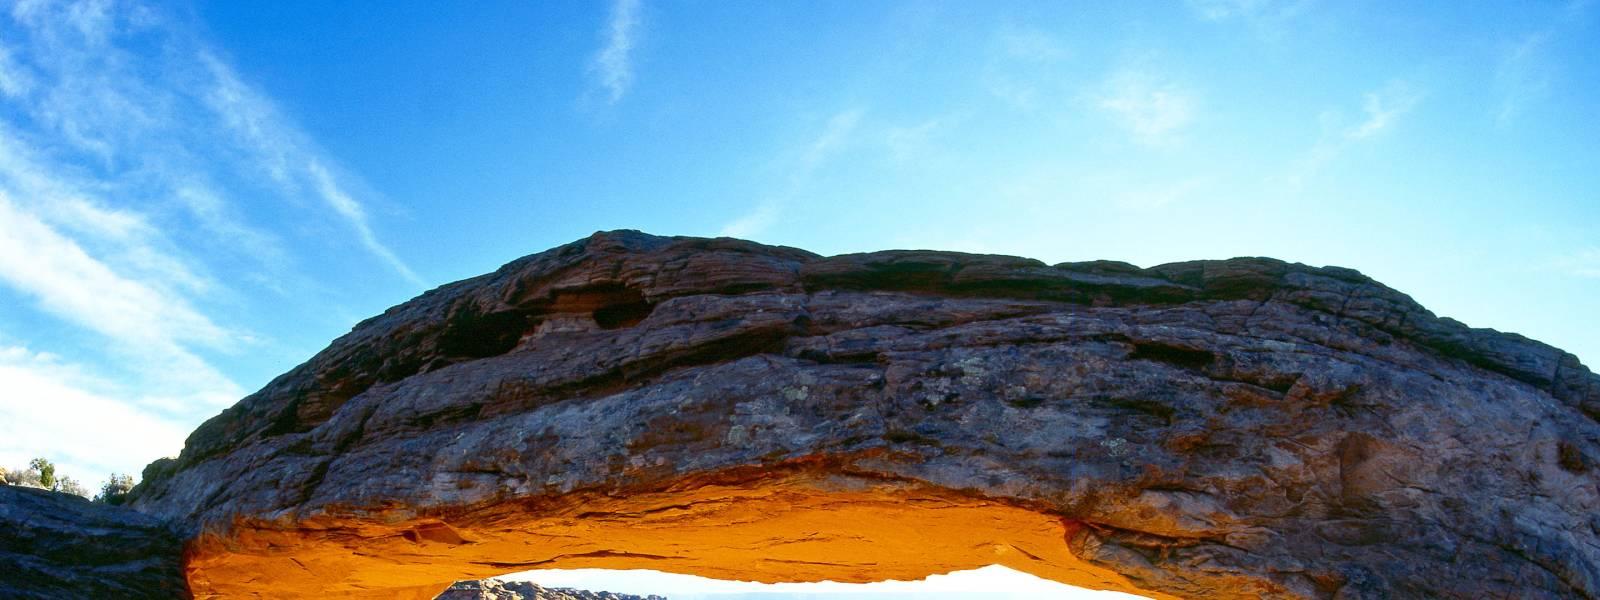 Mesa archway